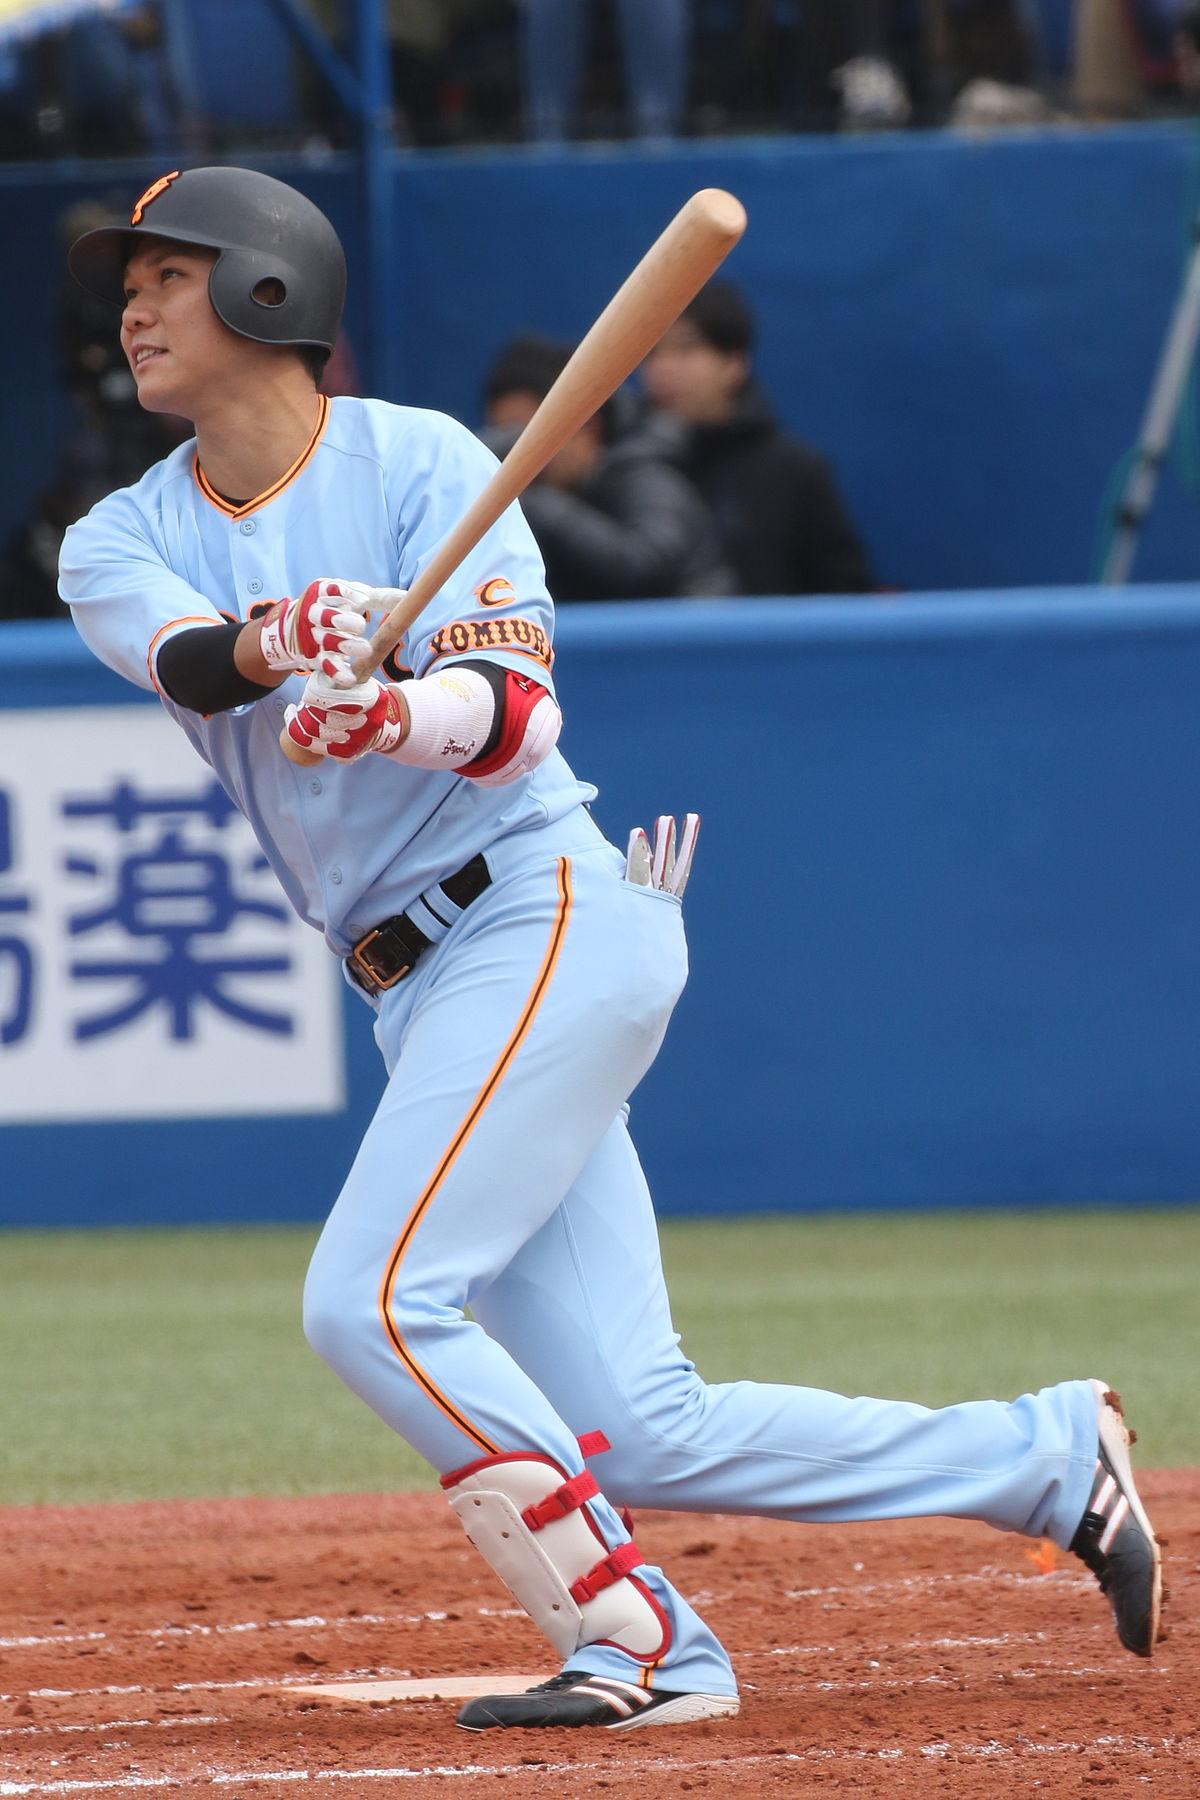 坂本勇人 - Wikipedia